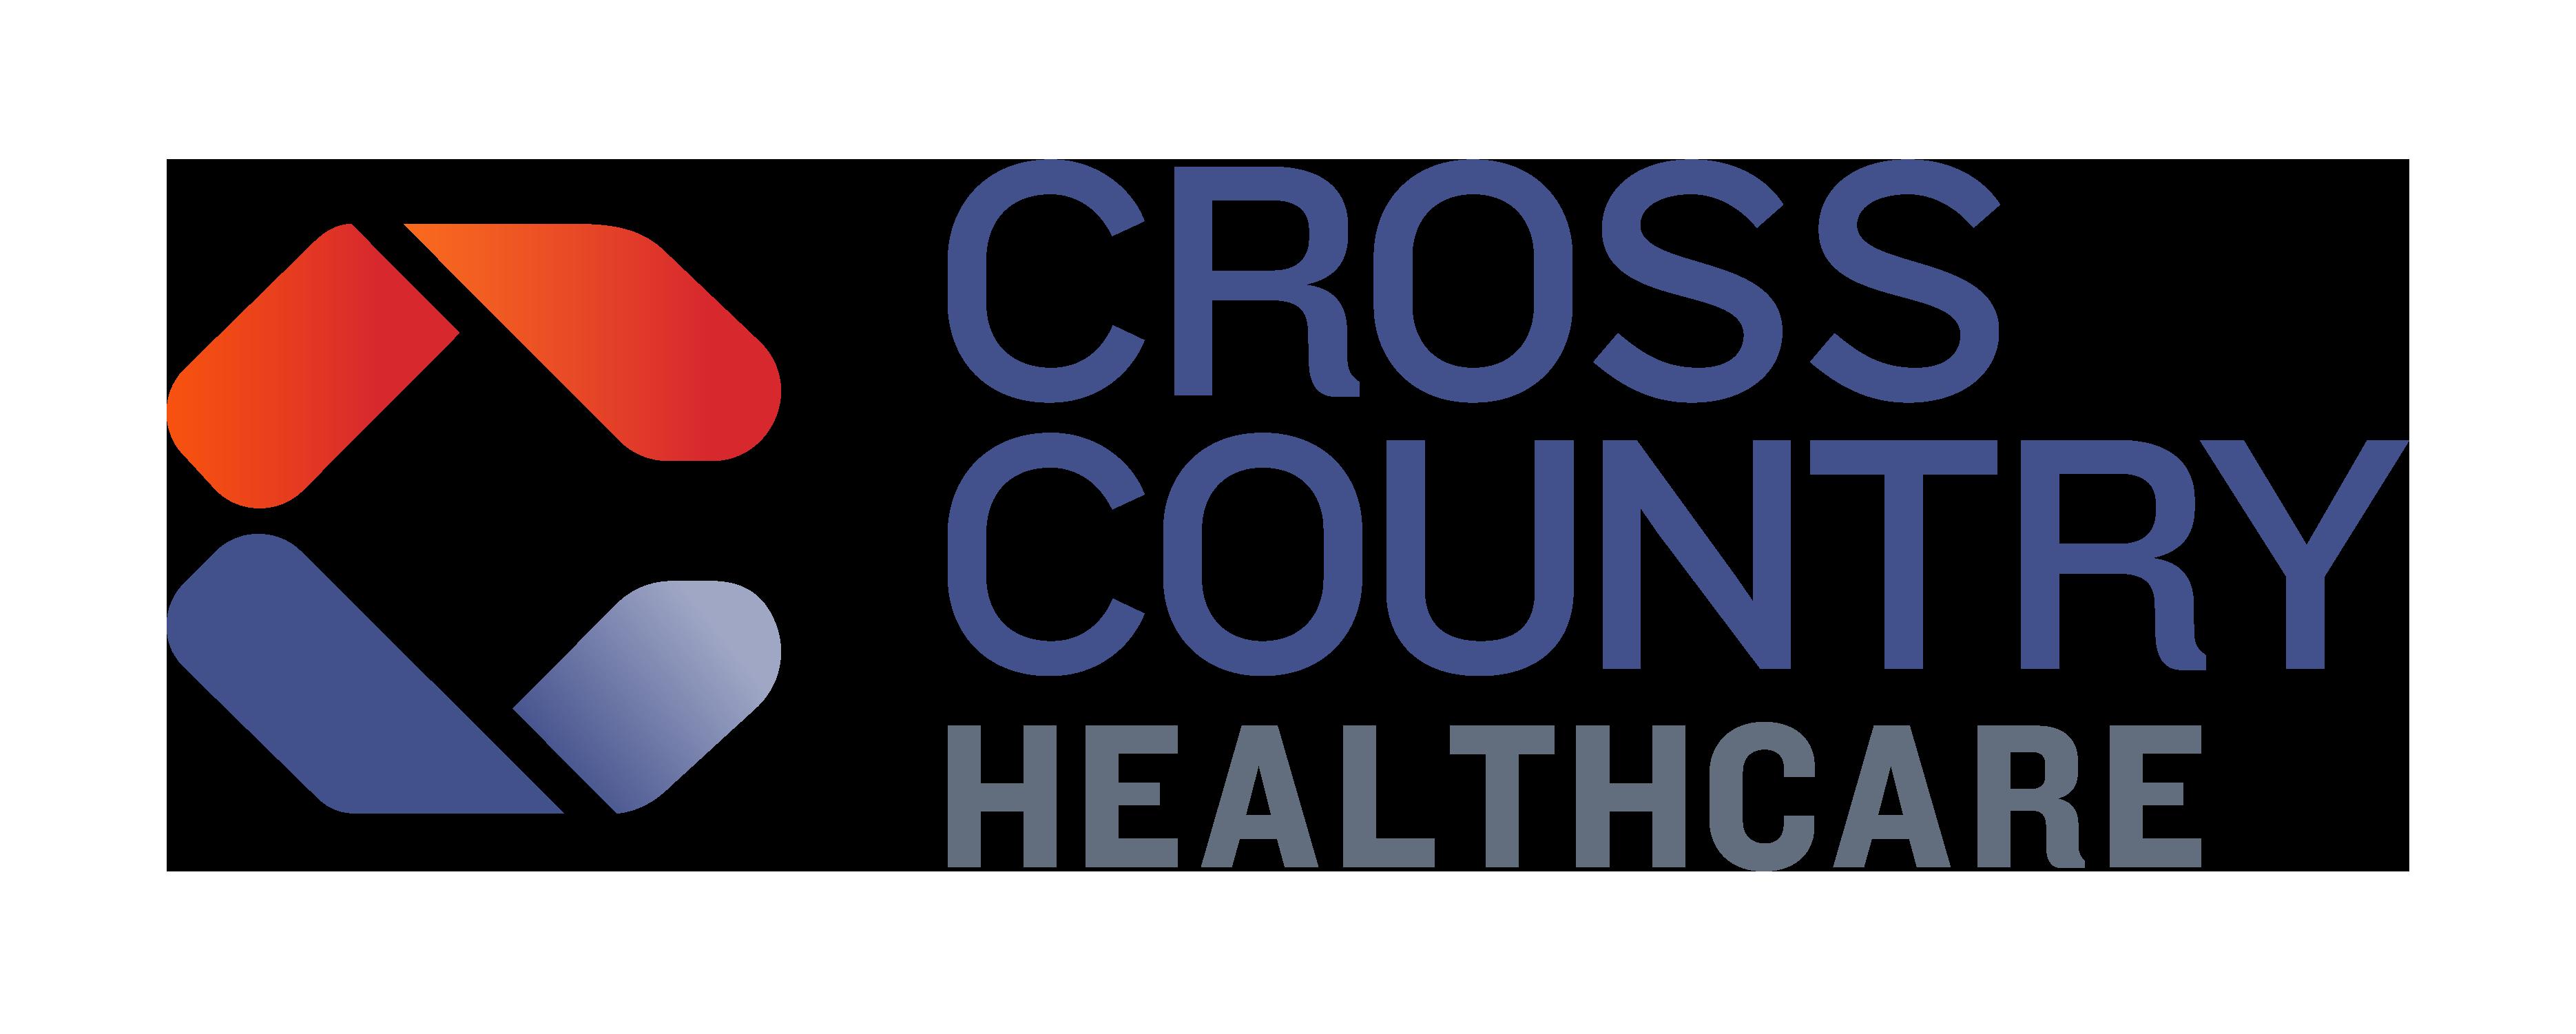 Cross Country Healthcare, Inc. logo